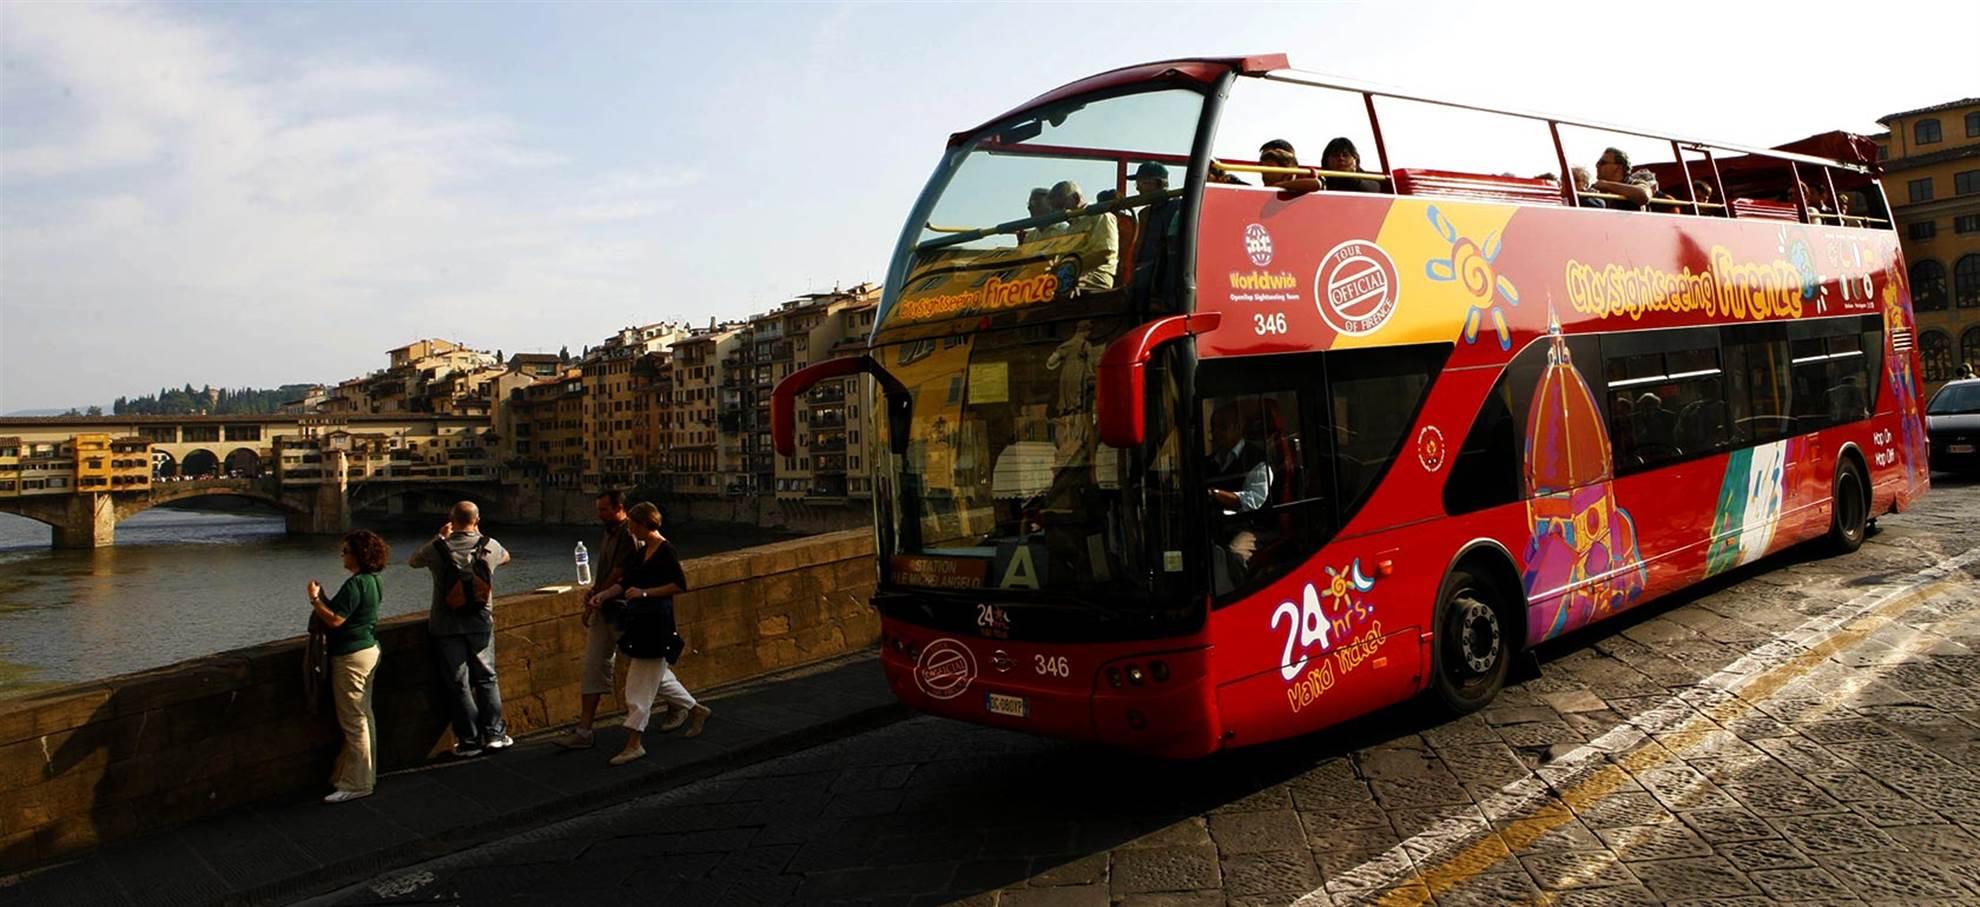 Florence Hop on Hop off Bus